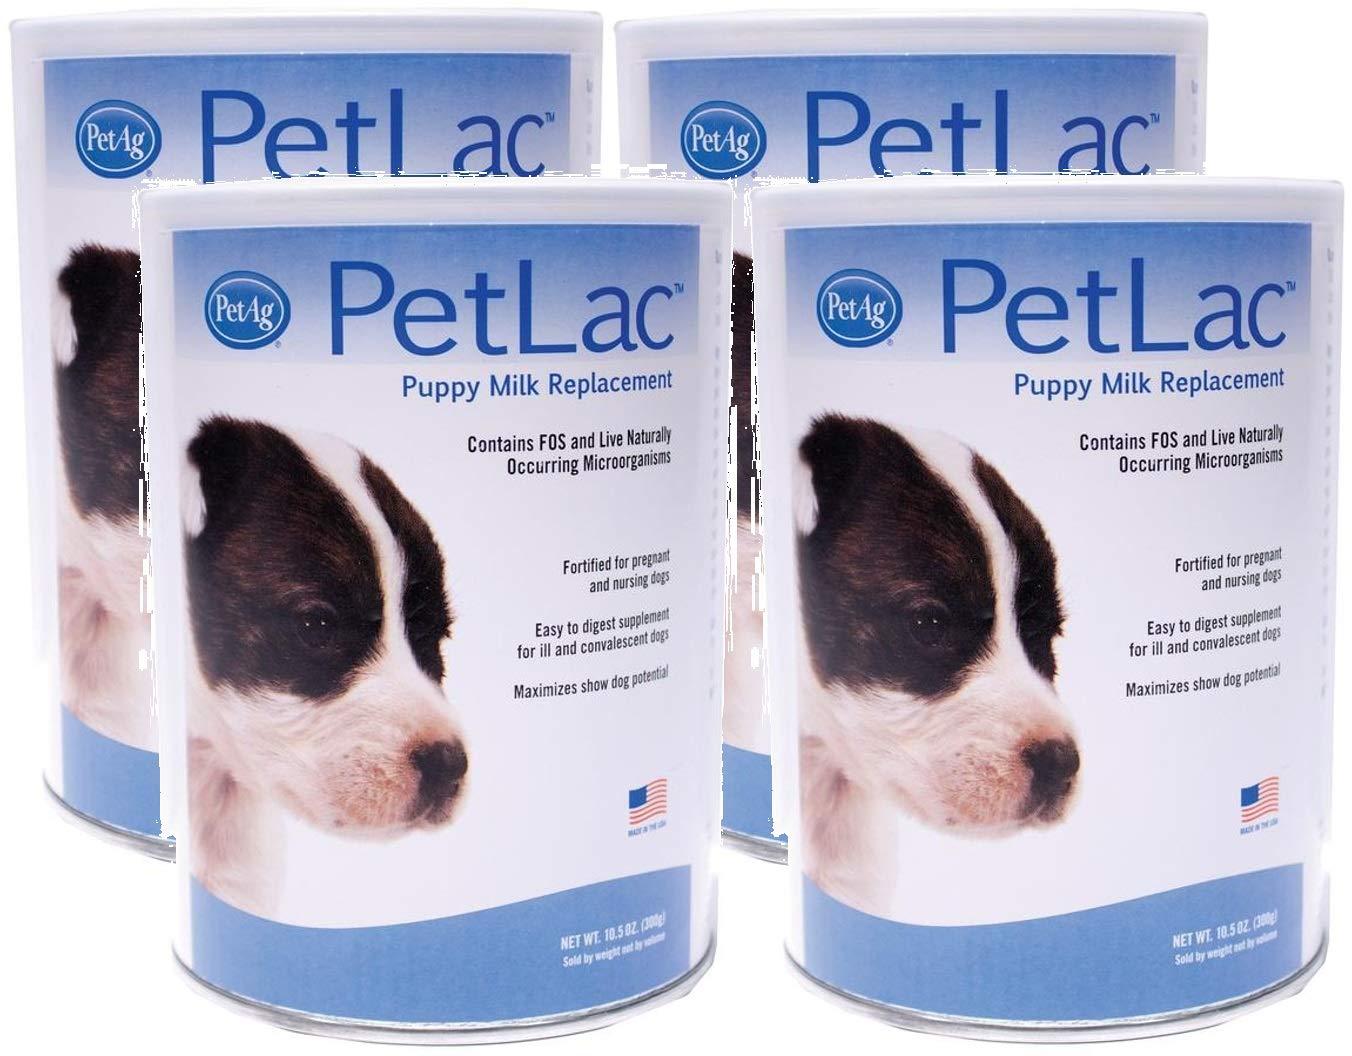 Pet Ag 4 Pack PetLac Milk Powder Puppies, 10.5-Ounces Each by PetAg